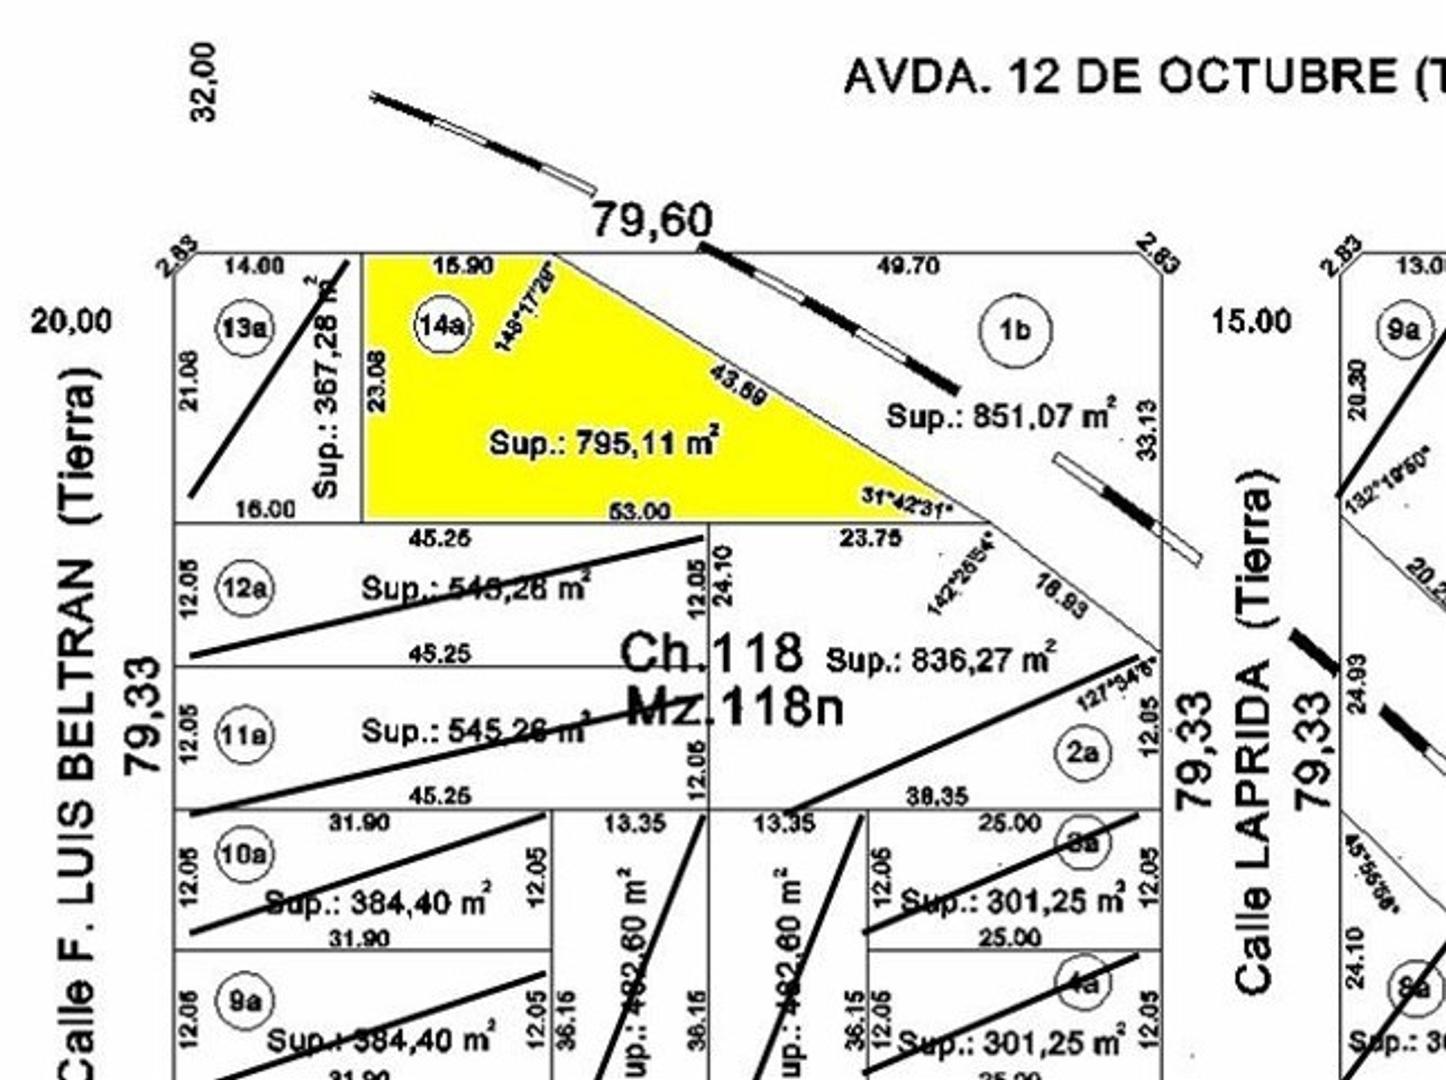 XINTEL(MEP-MEP-872) Lote - Venta - Argentina, CORONEL SUÁREZ